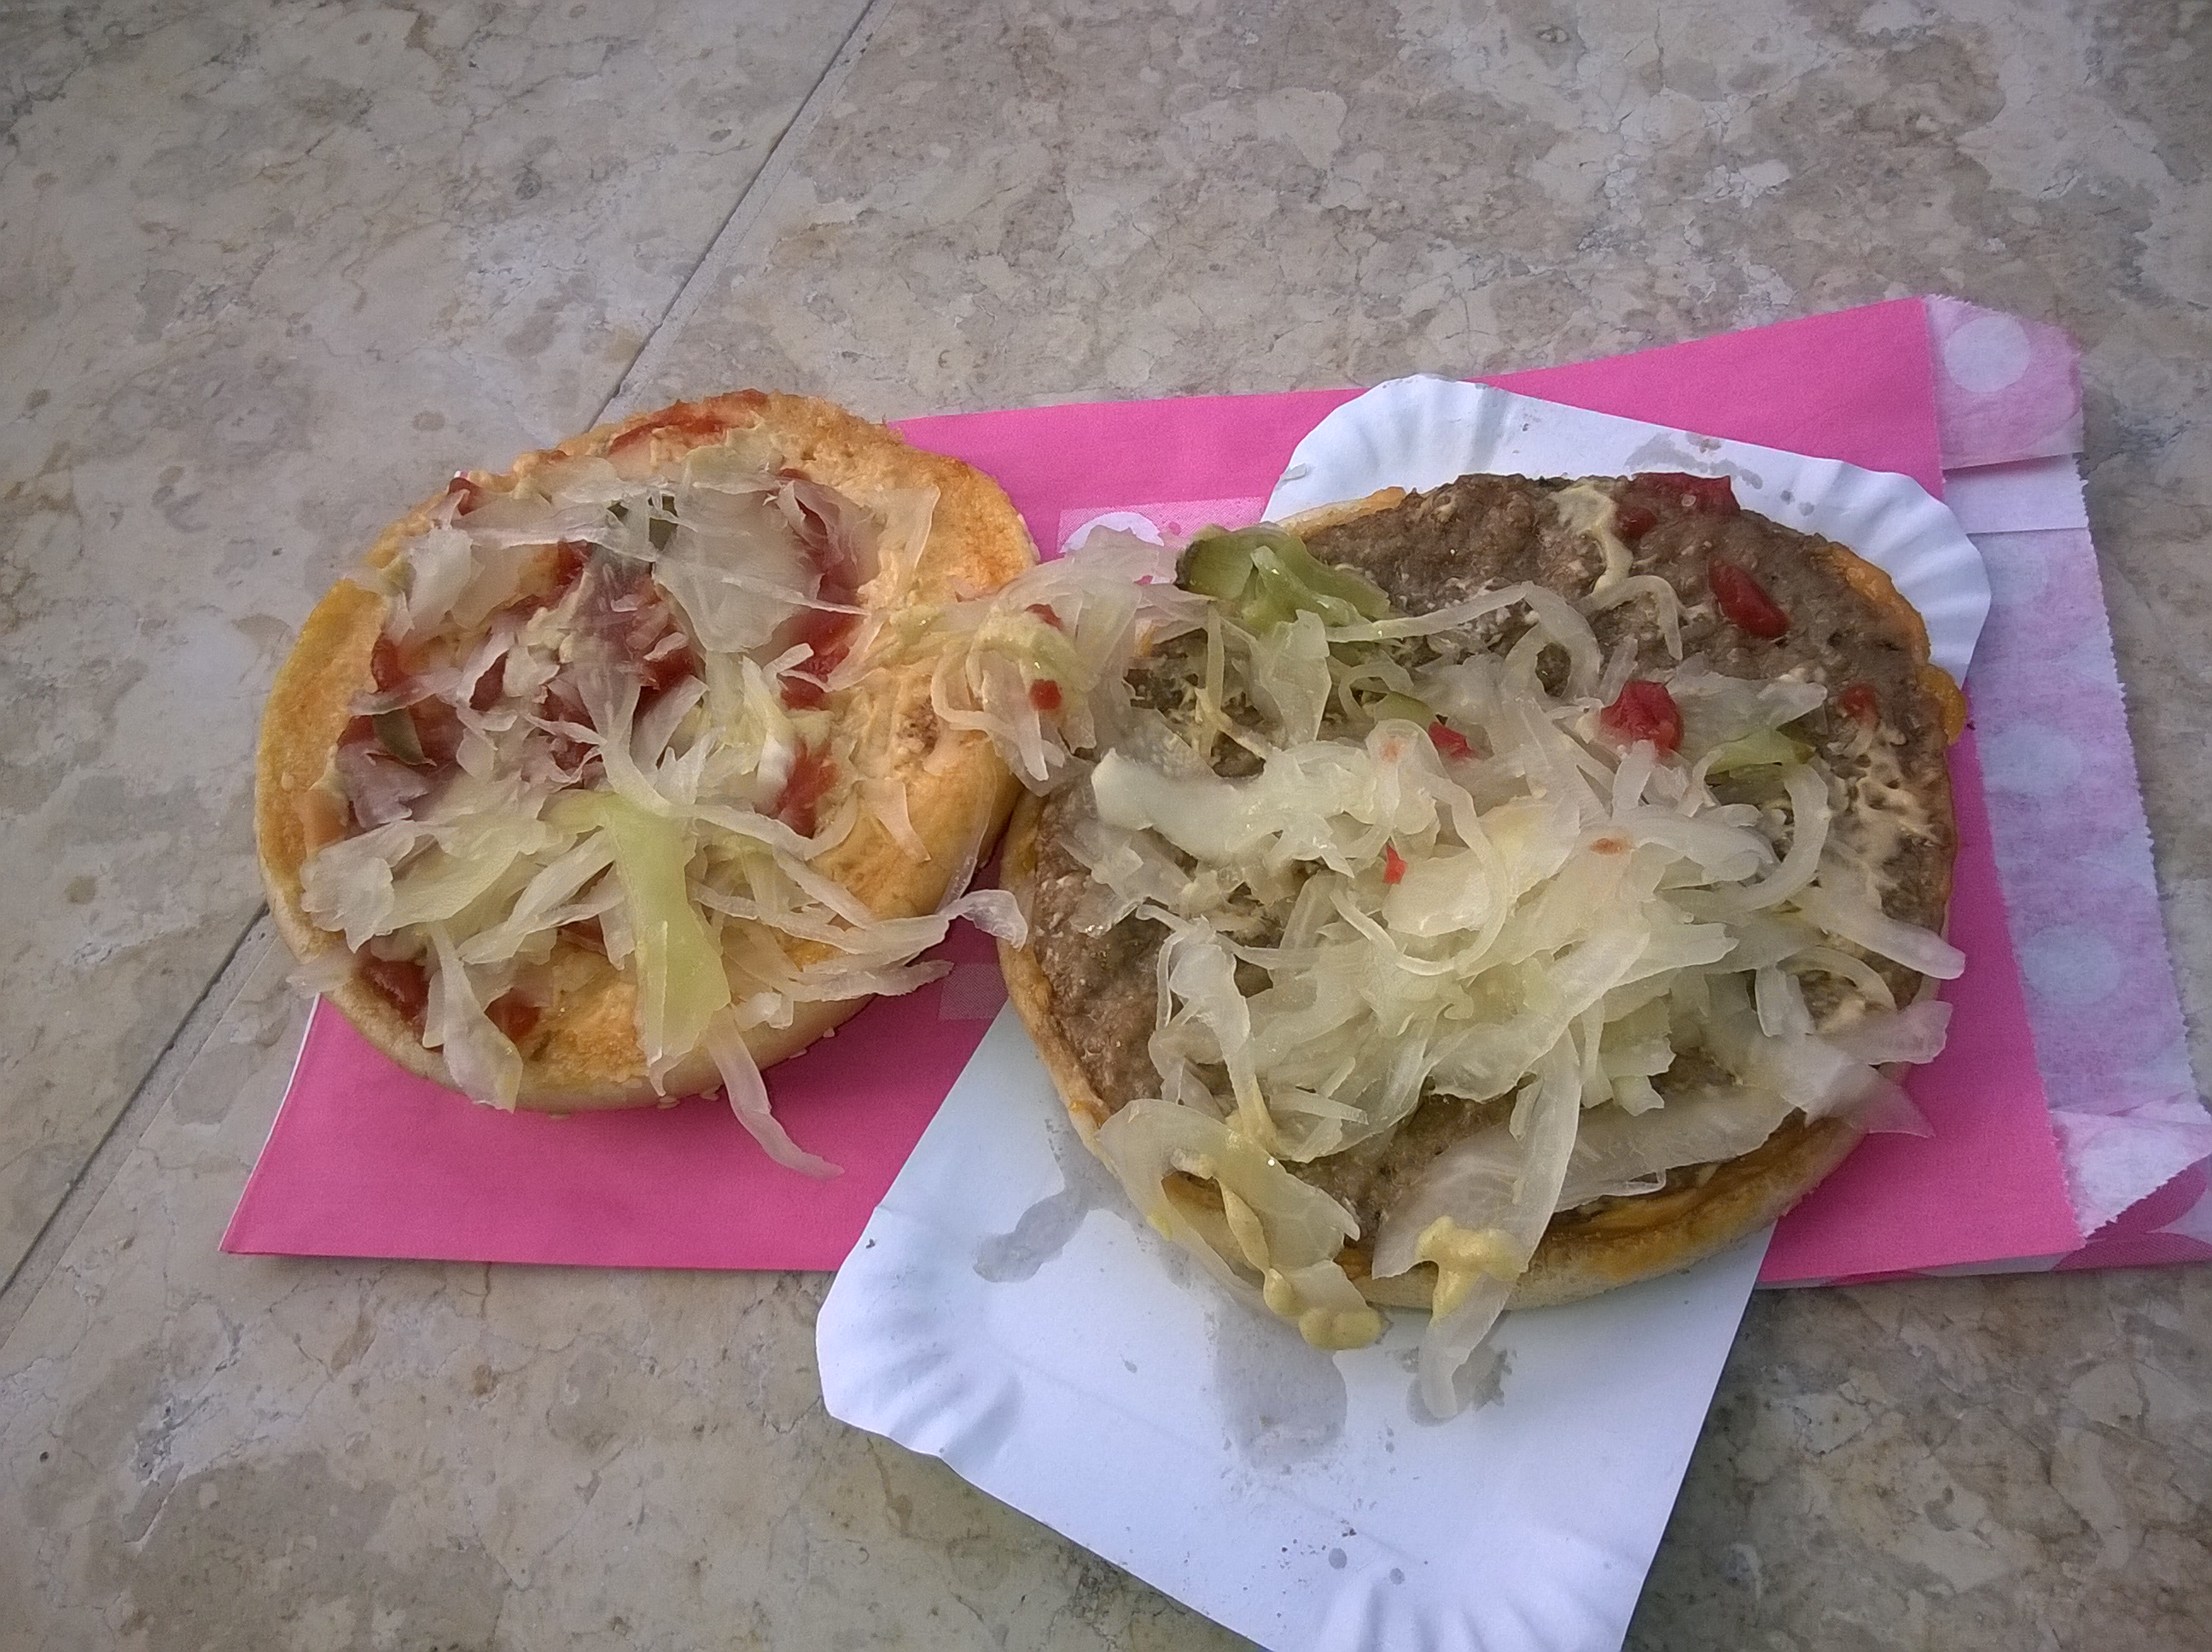 hoop_hamburger_allee_arkad_6.jpg